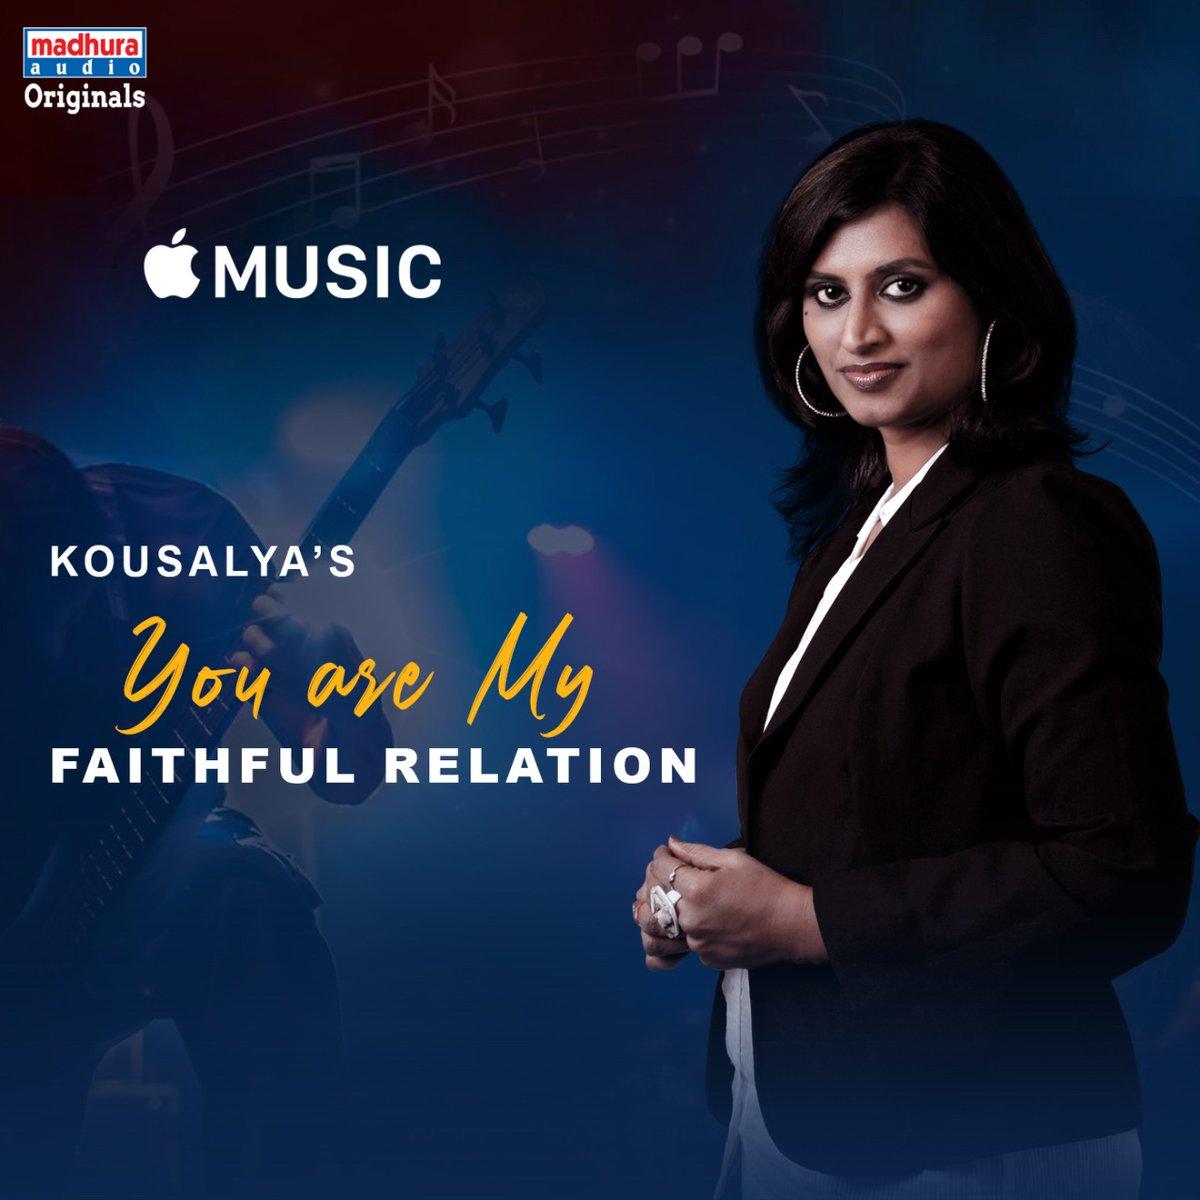 Talented Singer @KousalyaPotturi's #YouAreMyFaithfulRelation IS Streaming On Your Favorite OTT App  @AppleMusic: https://music.apple.com/in/album/you-are-my-faithful-relation-single/1518531301…pic.twitter.com/kNdelp9Nlj